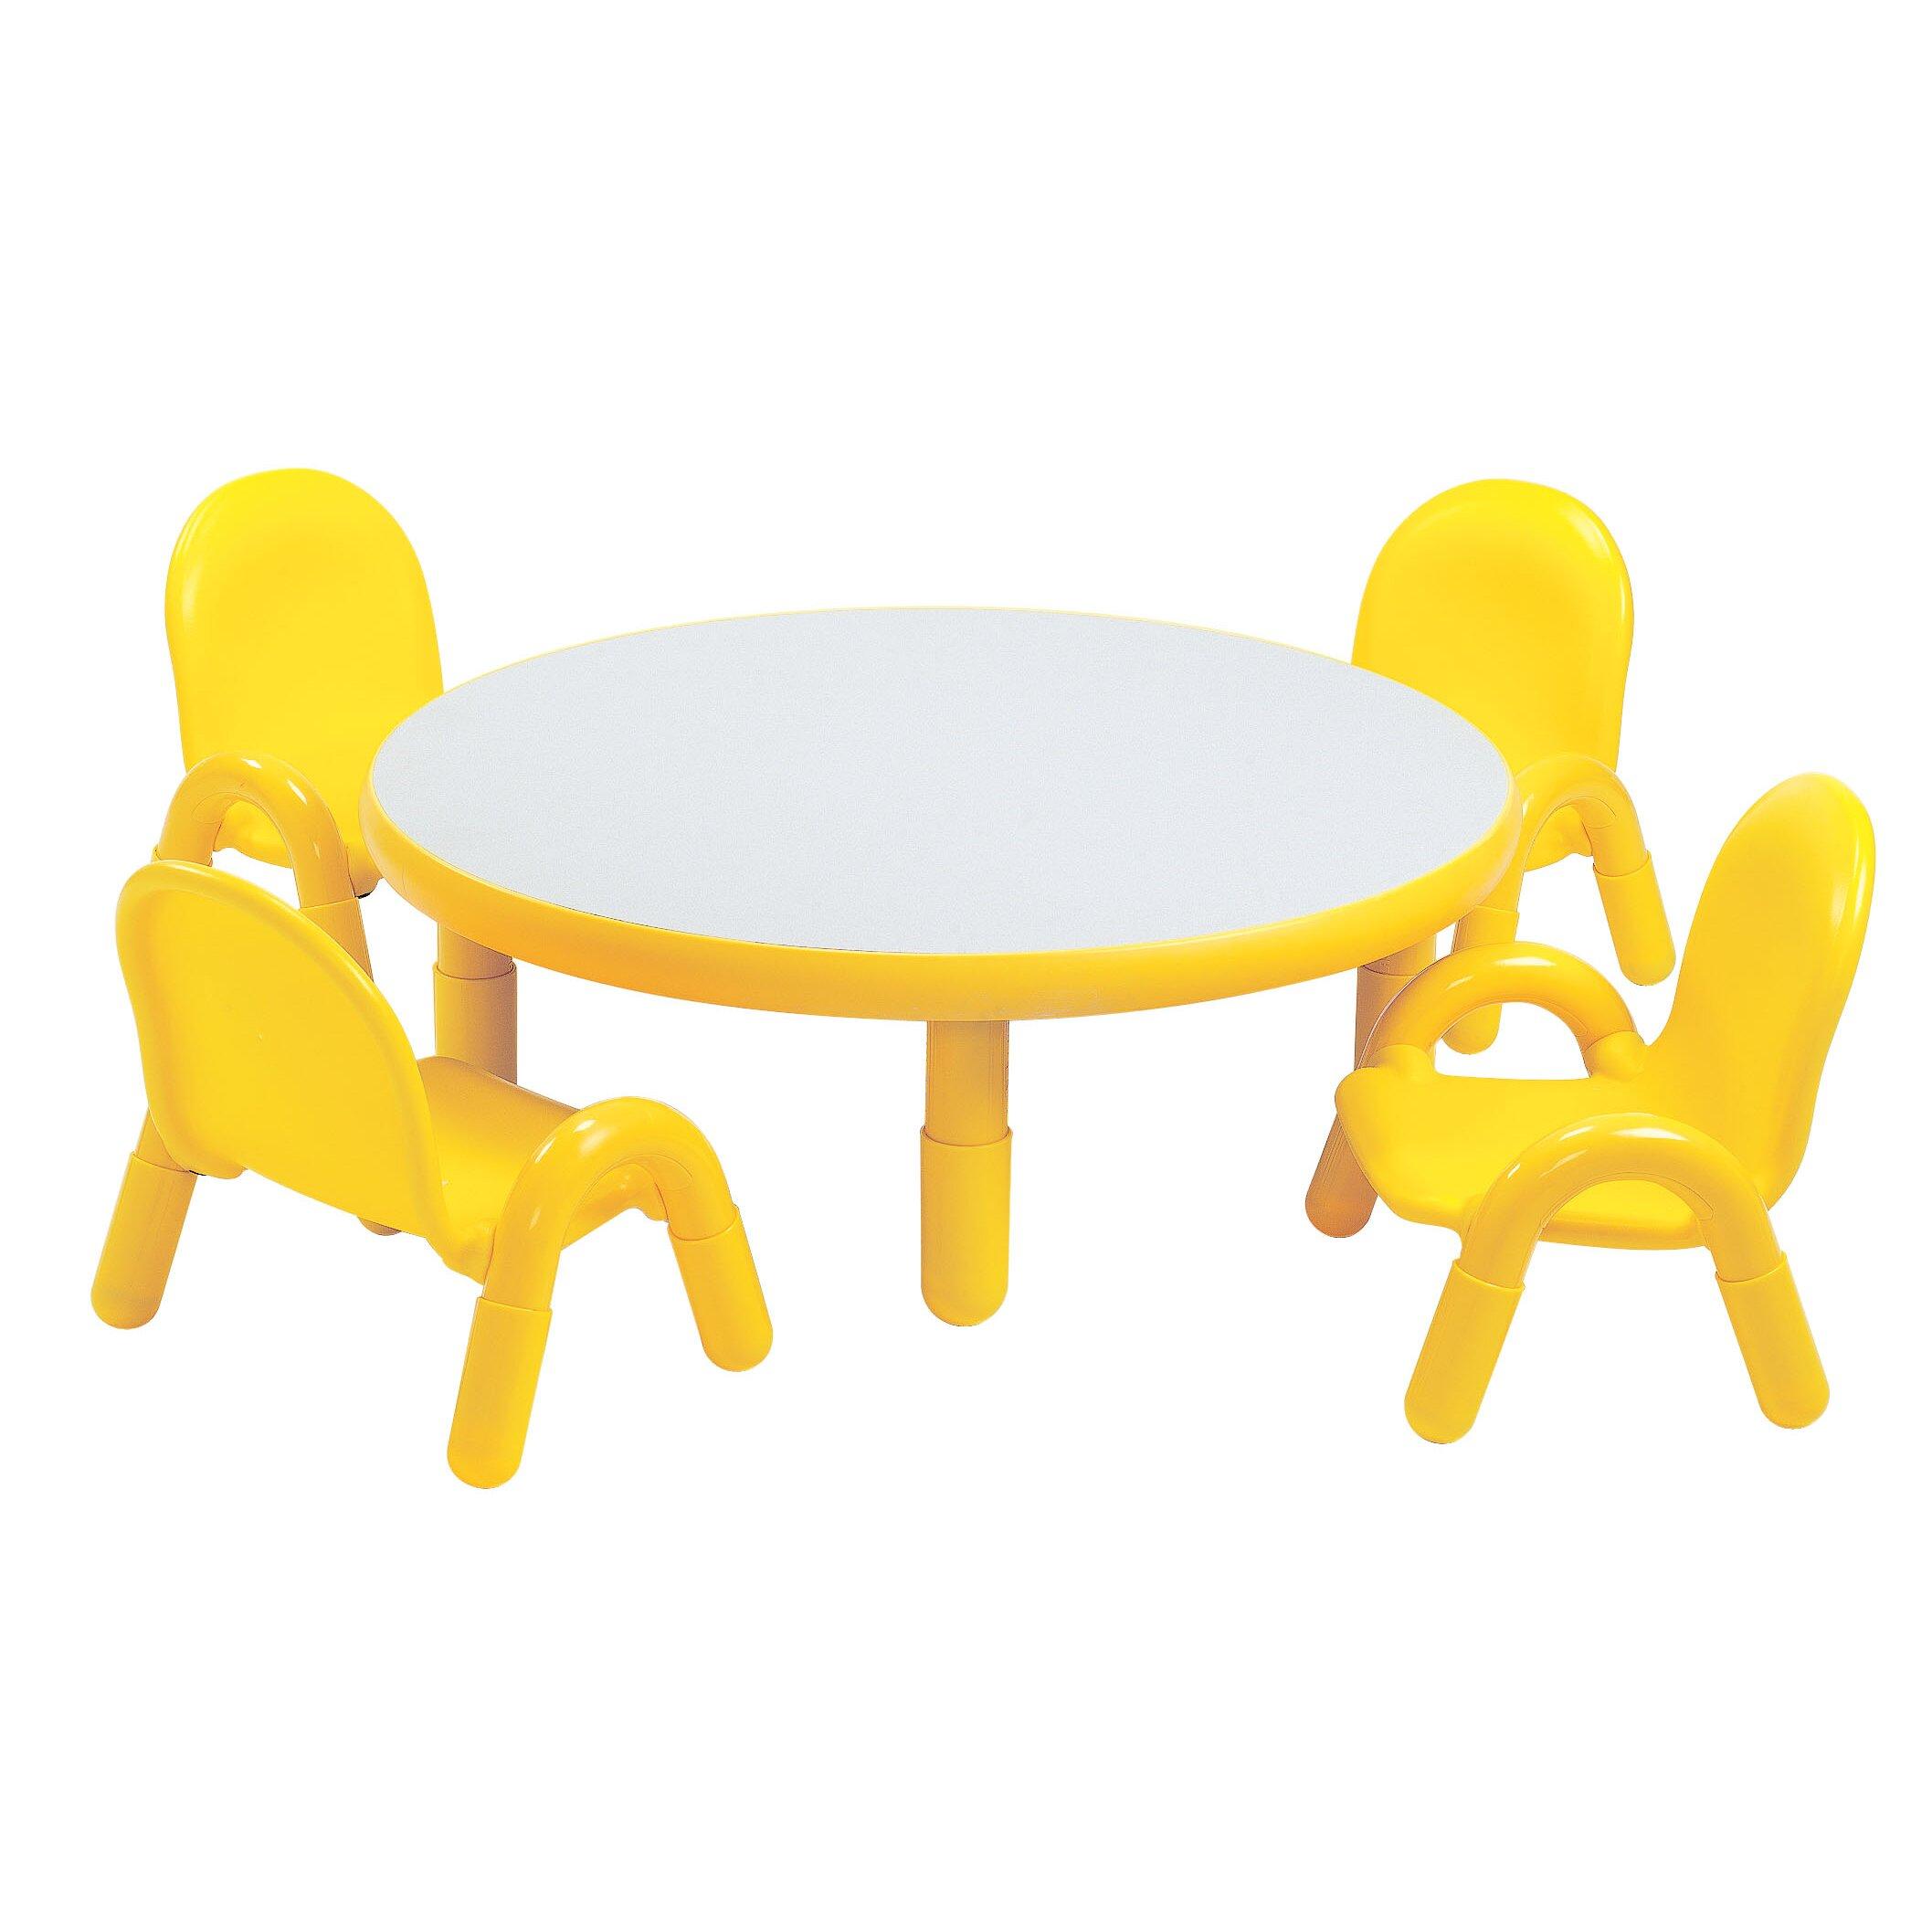 Round Toddler Table Starrkingschool